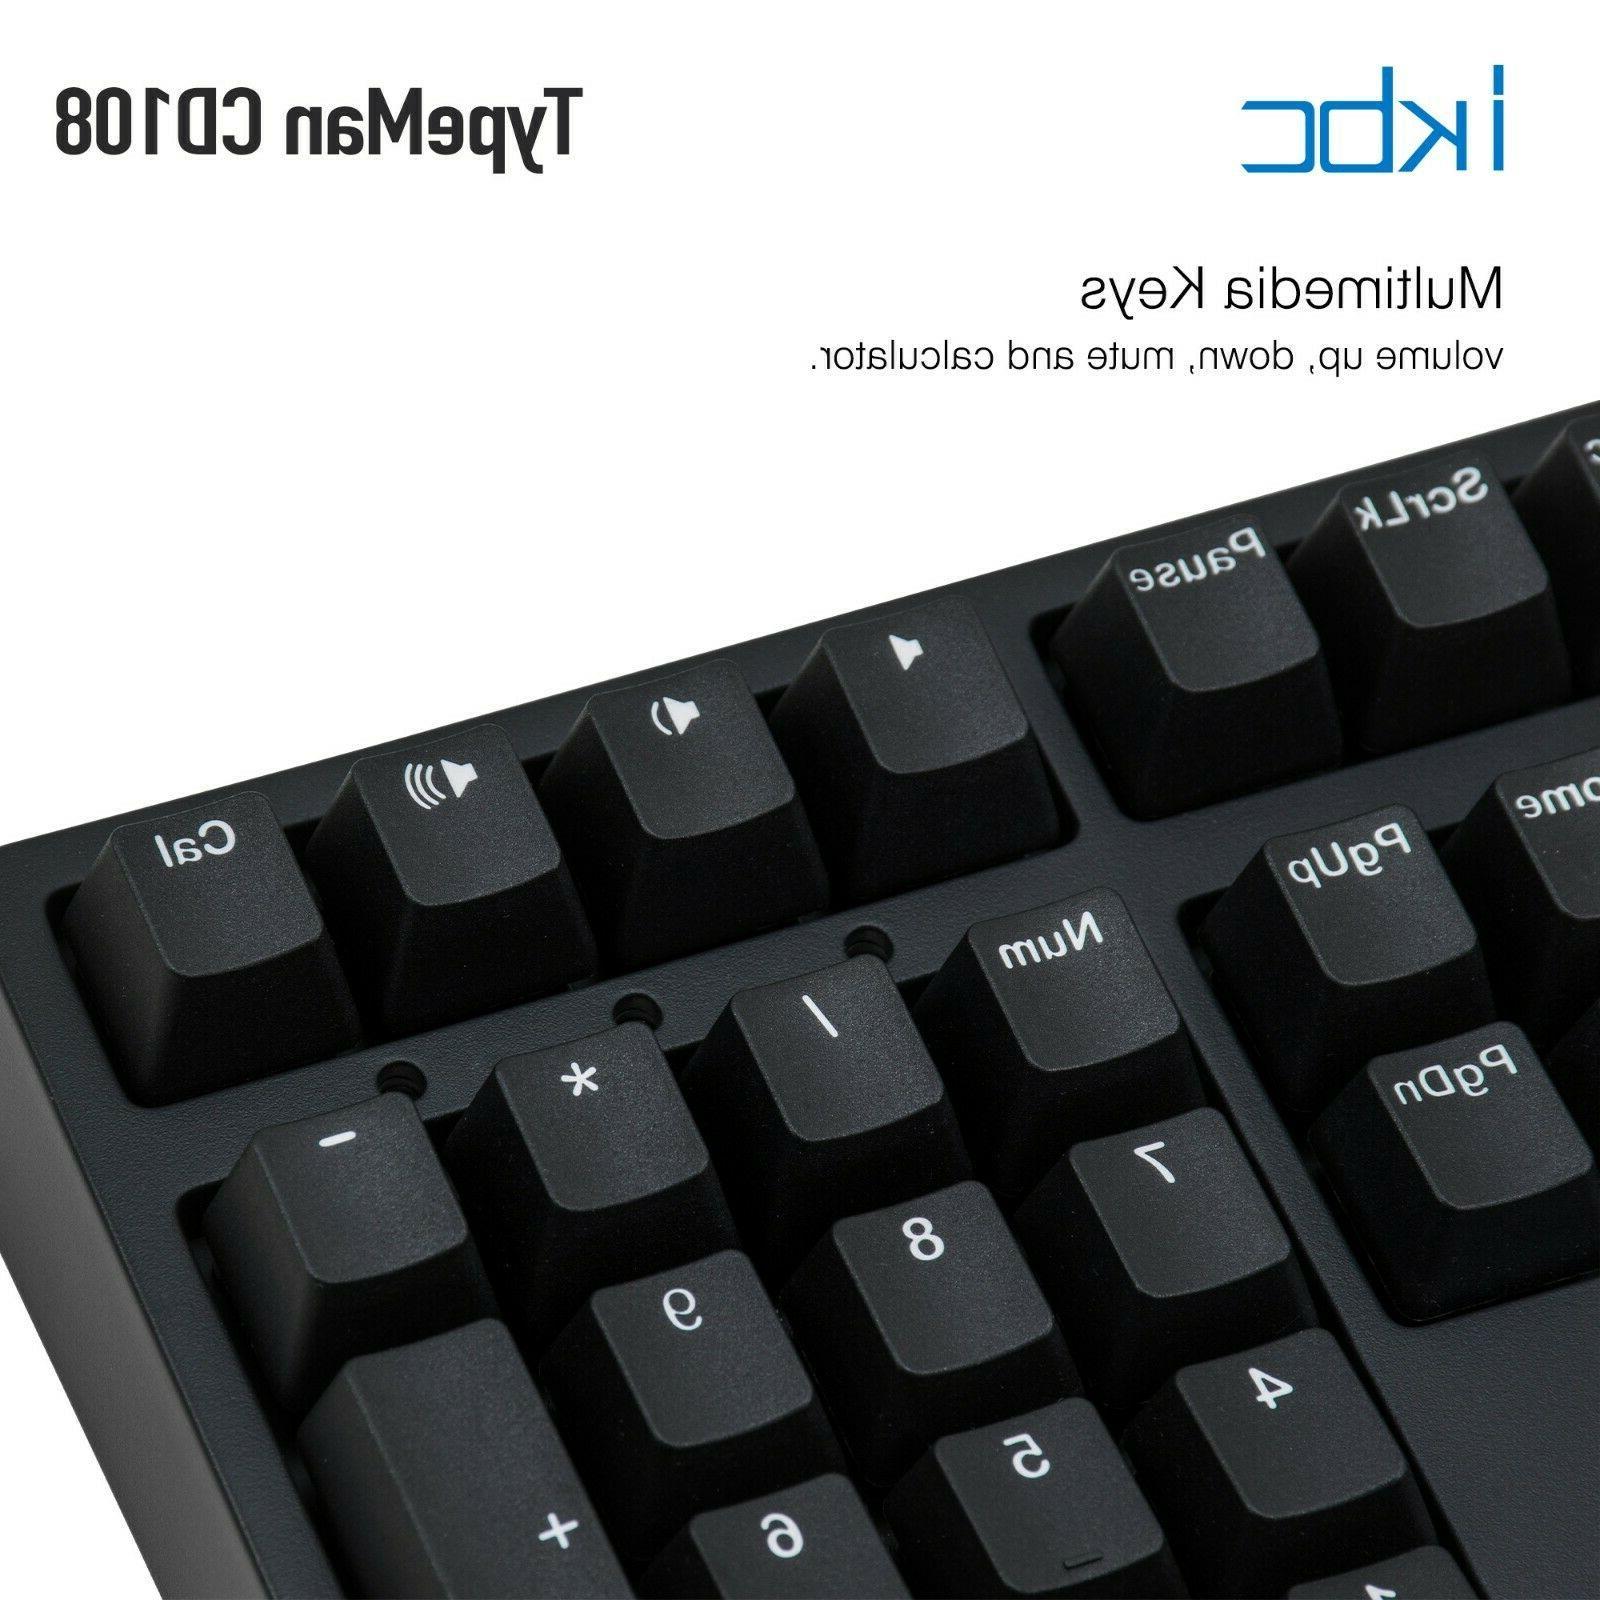 iKBC v2 Mechanical Ergonomic Keyboard with Cherry MX 108-Key,